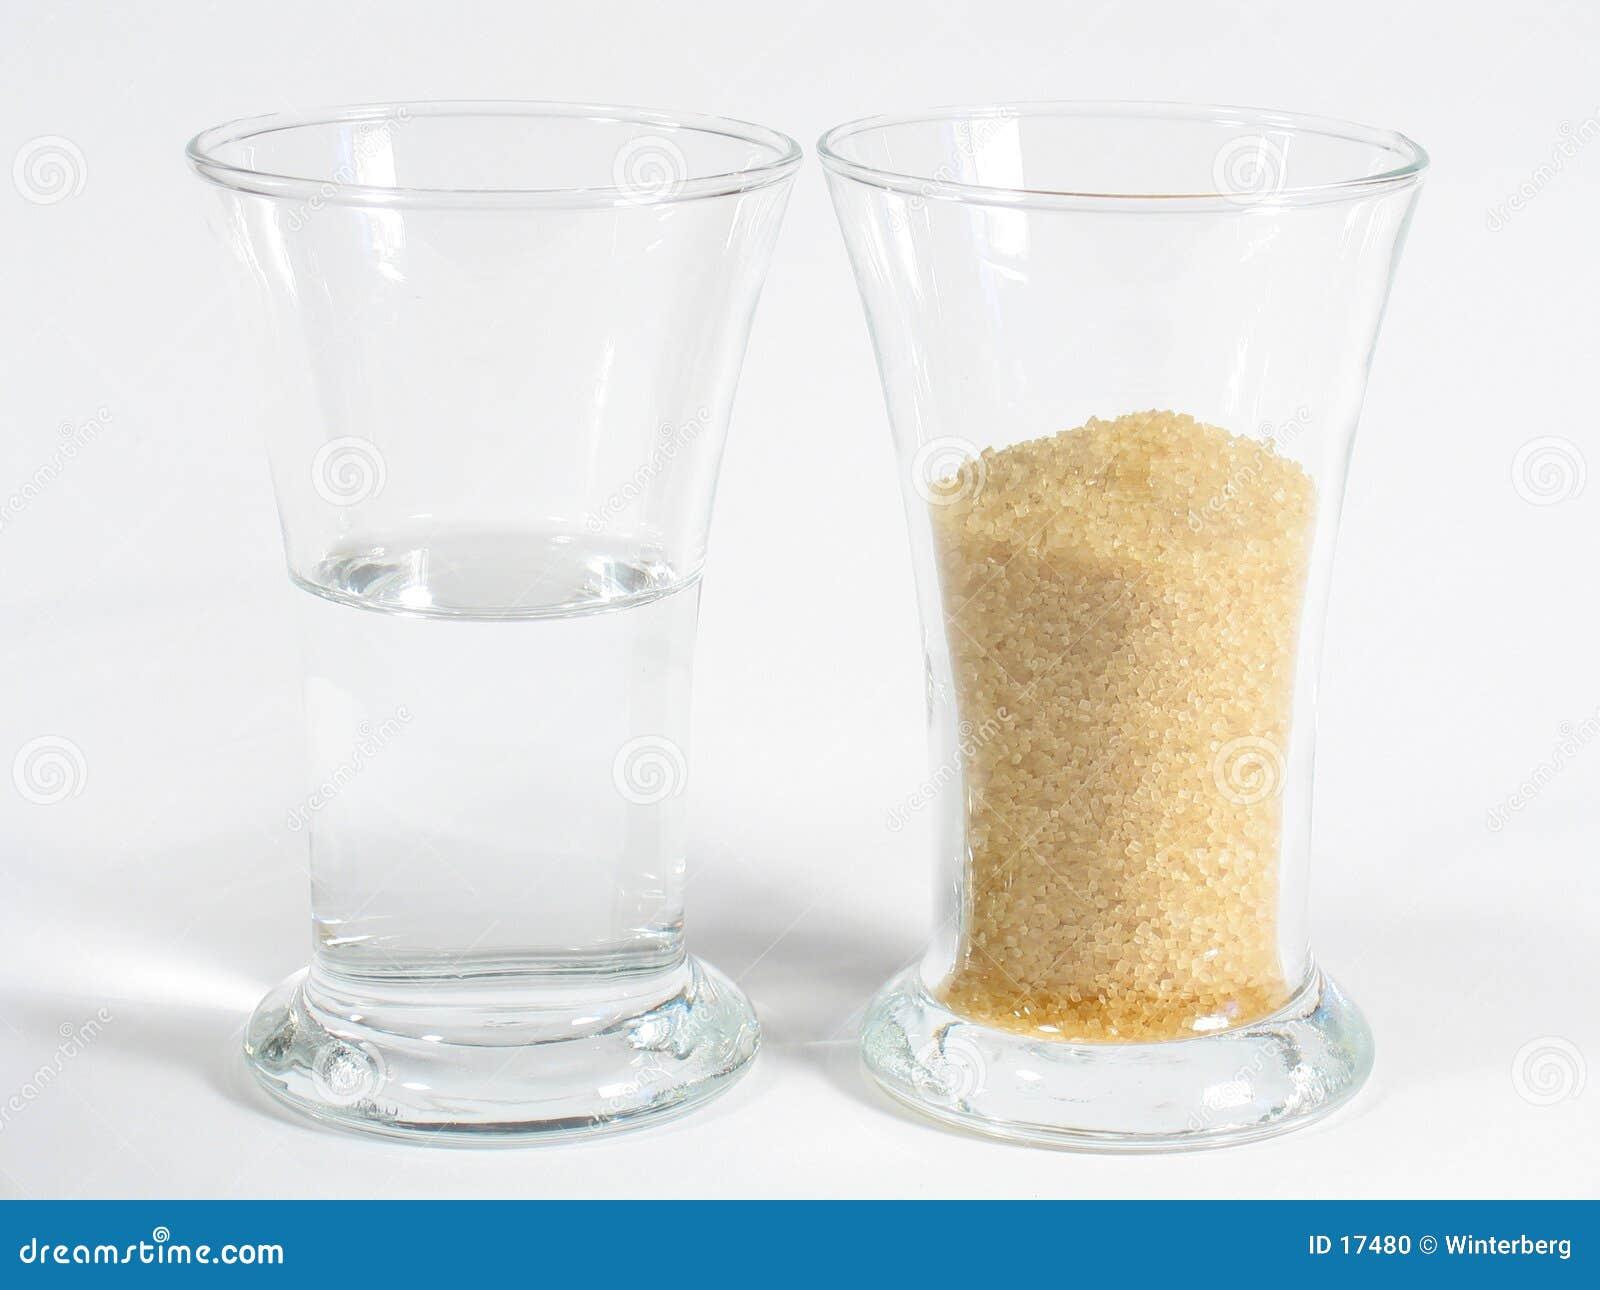 White Rum and Brown Sugar